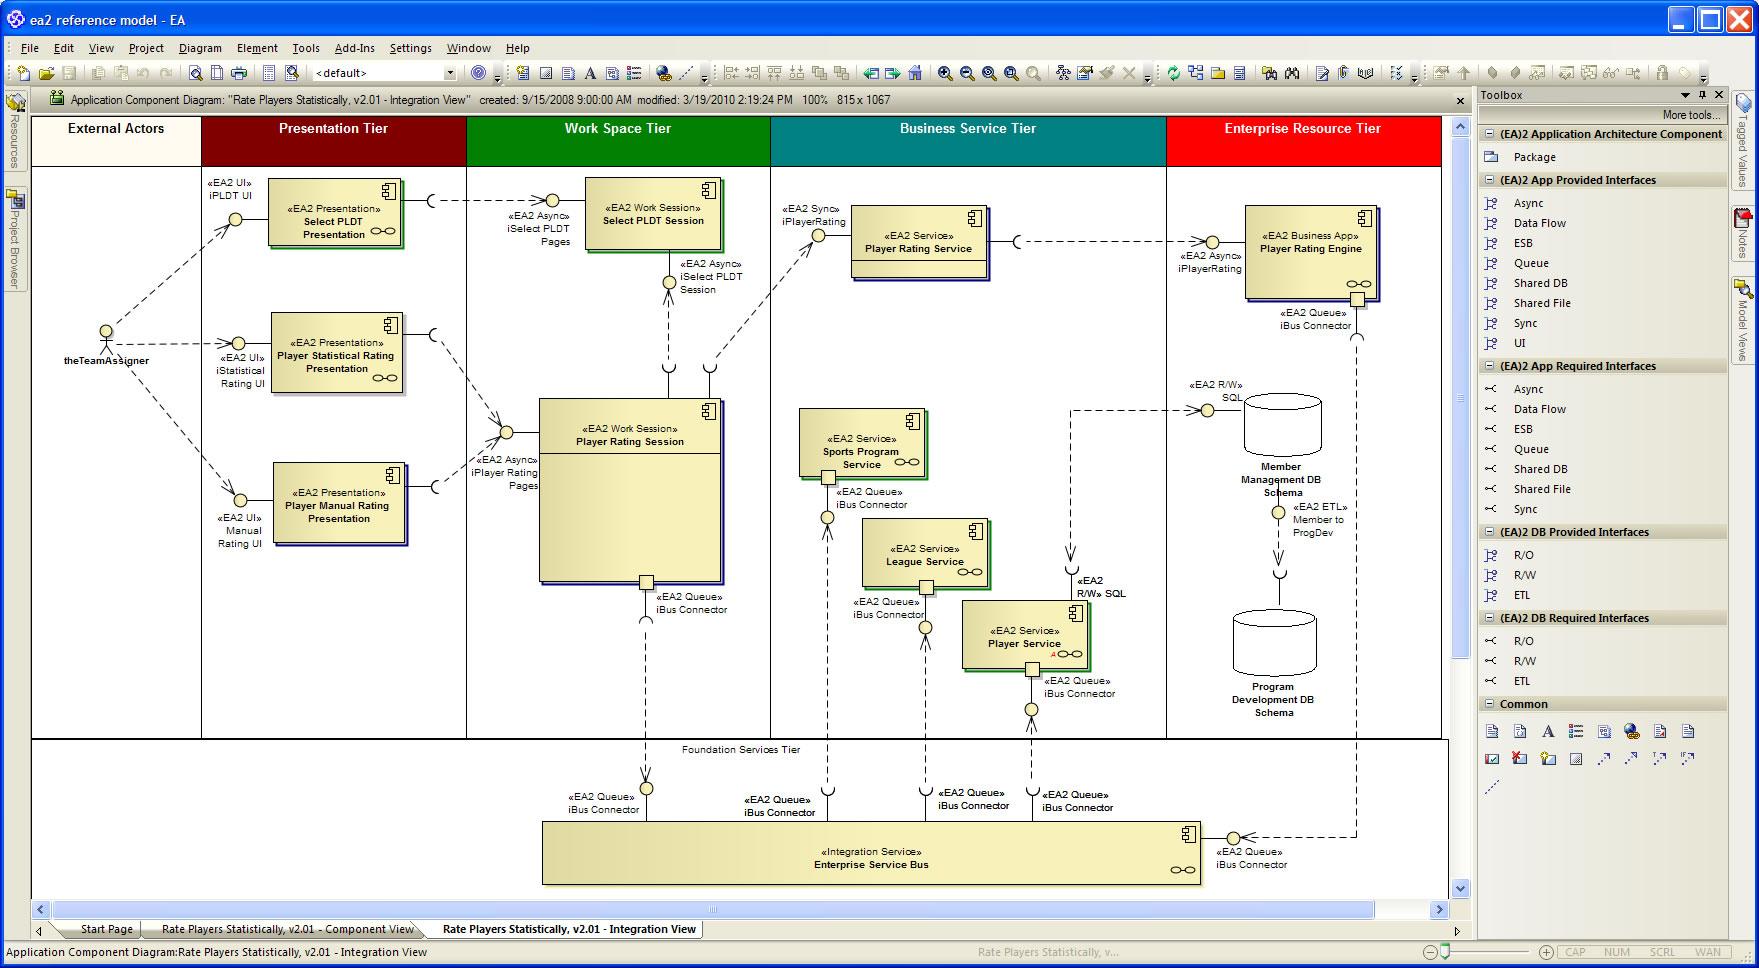 hight resolution of  ea 2 enterprise architecture modeling framework